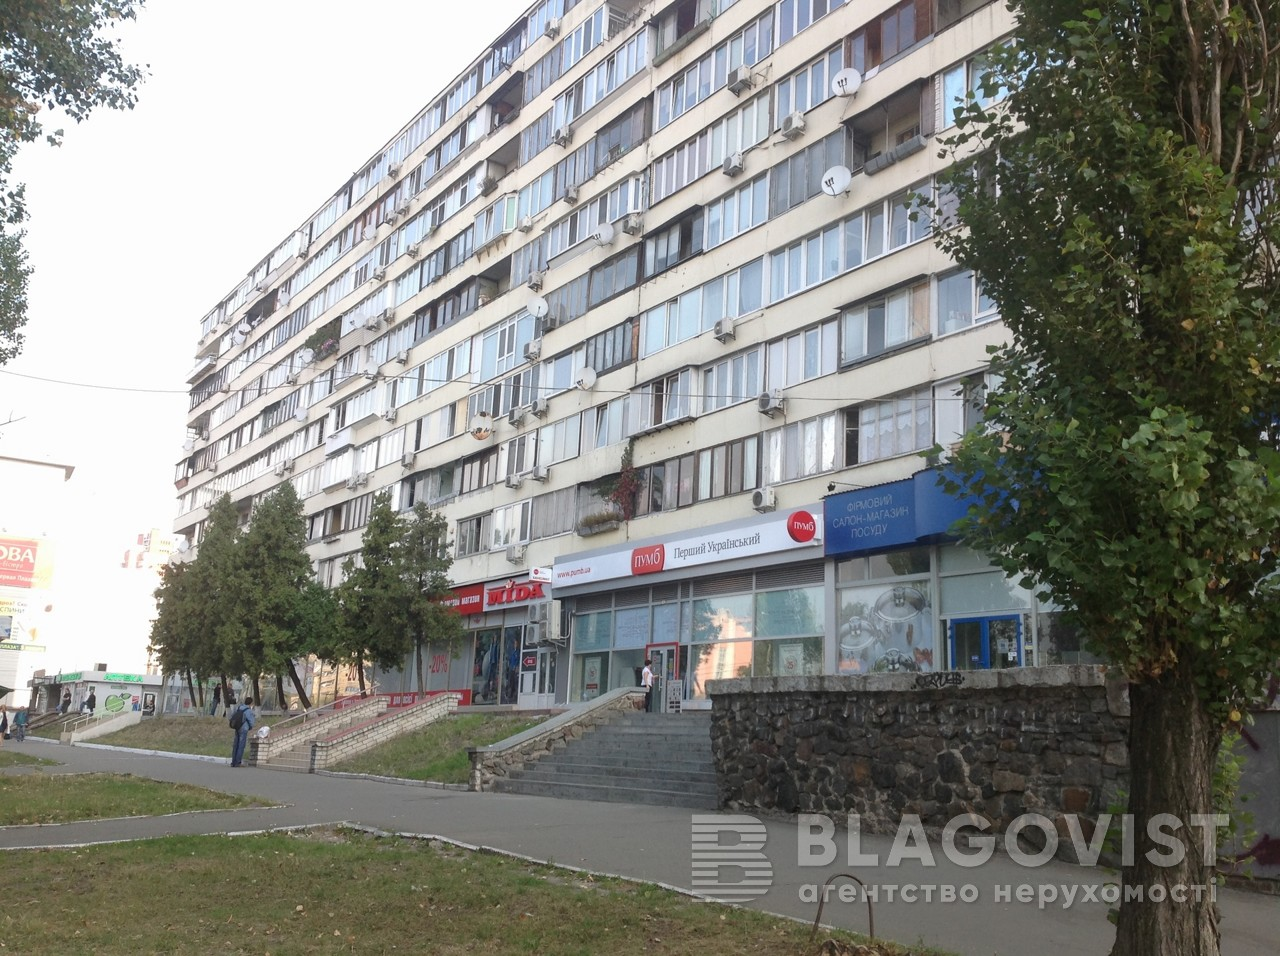 Квартира A-106326, Велика Васильківська, 145/1, Київ - Фото 1